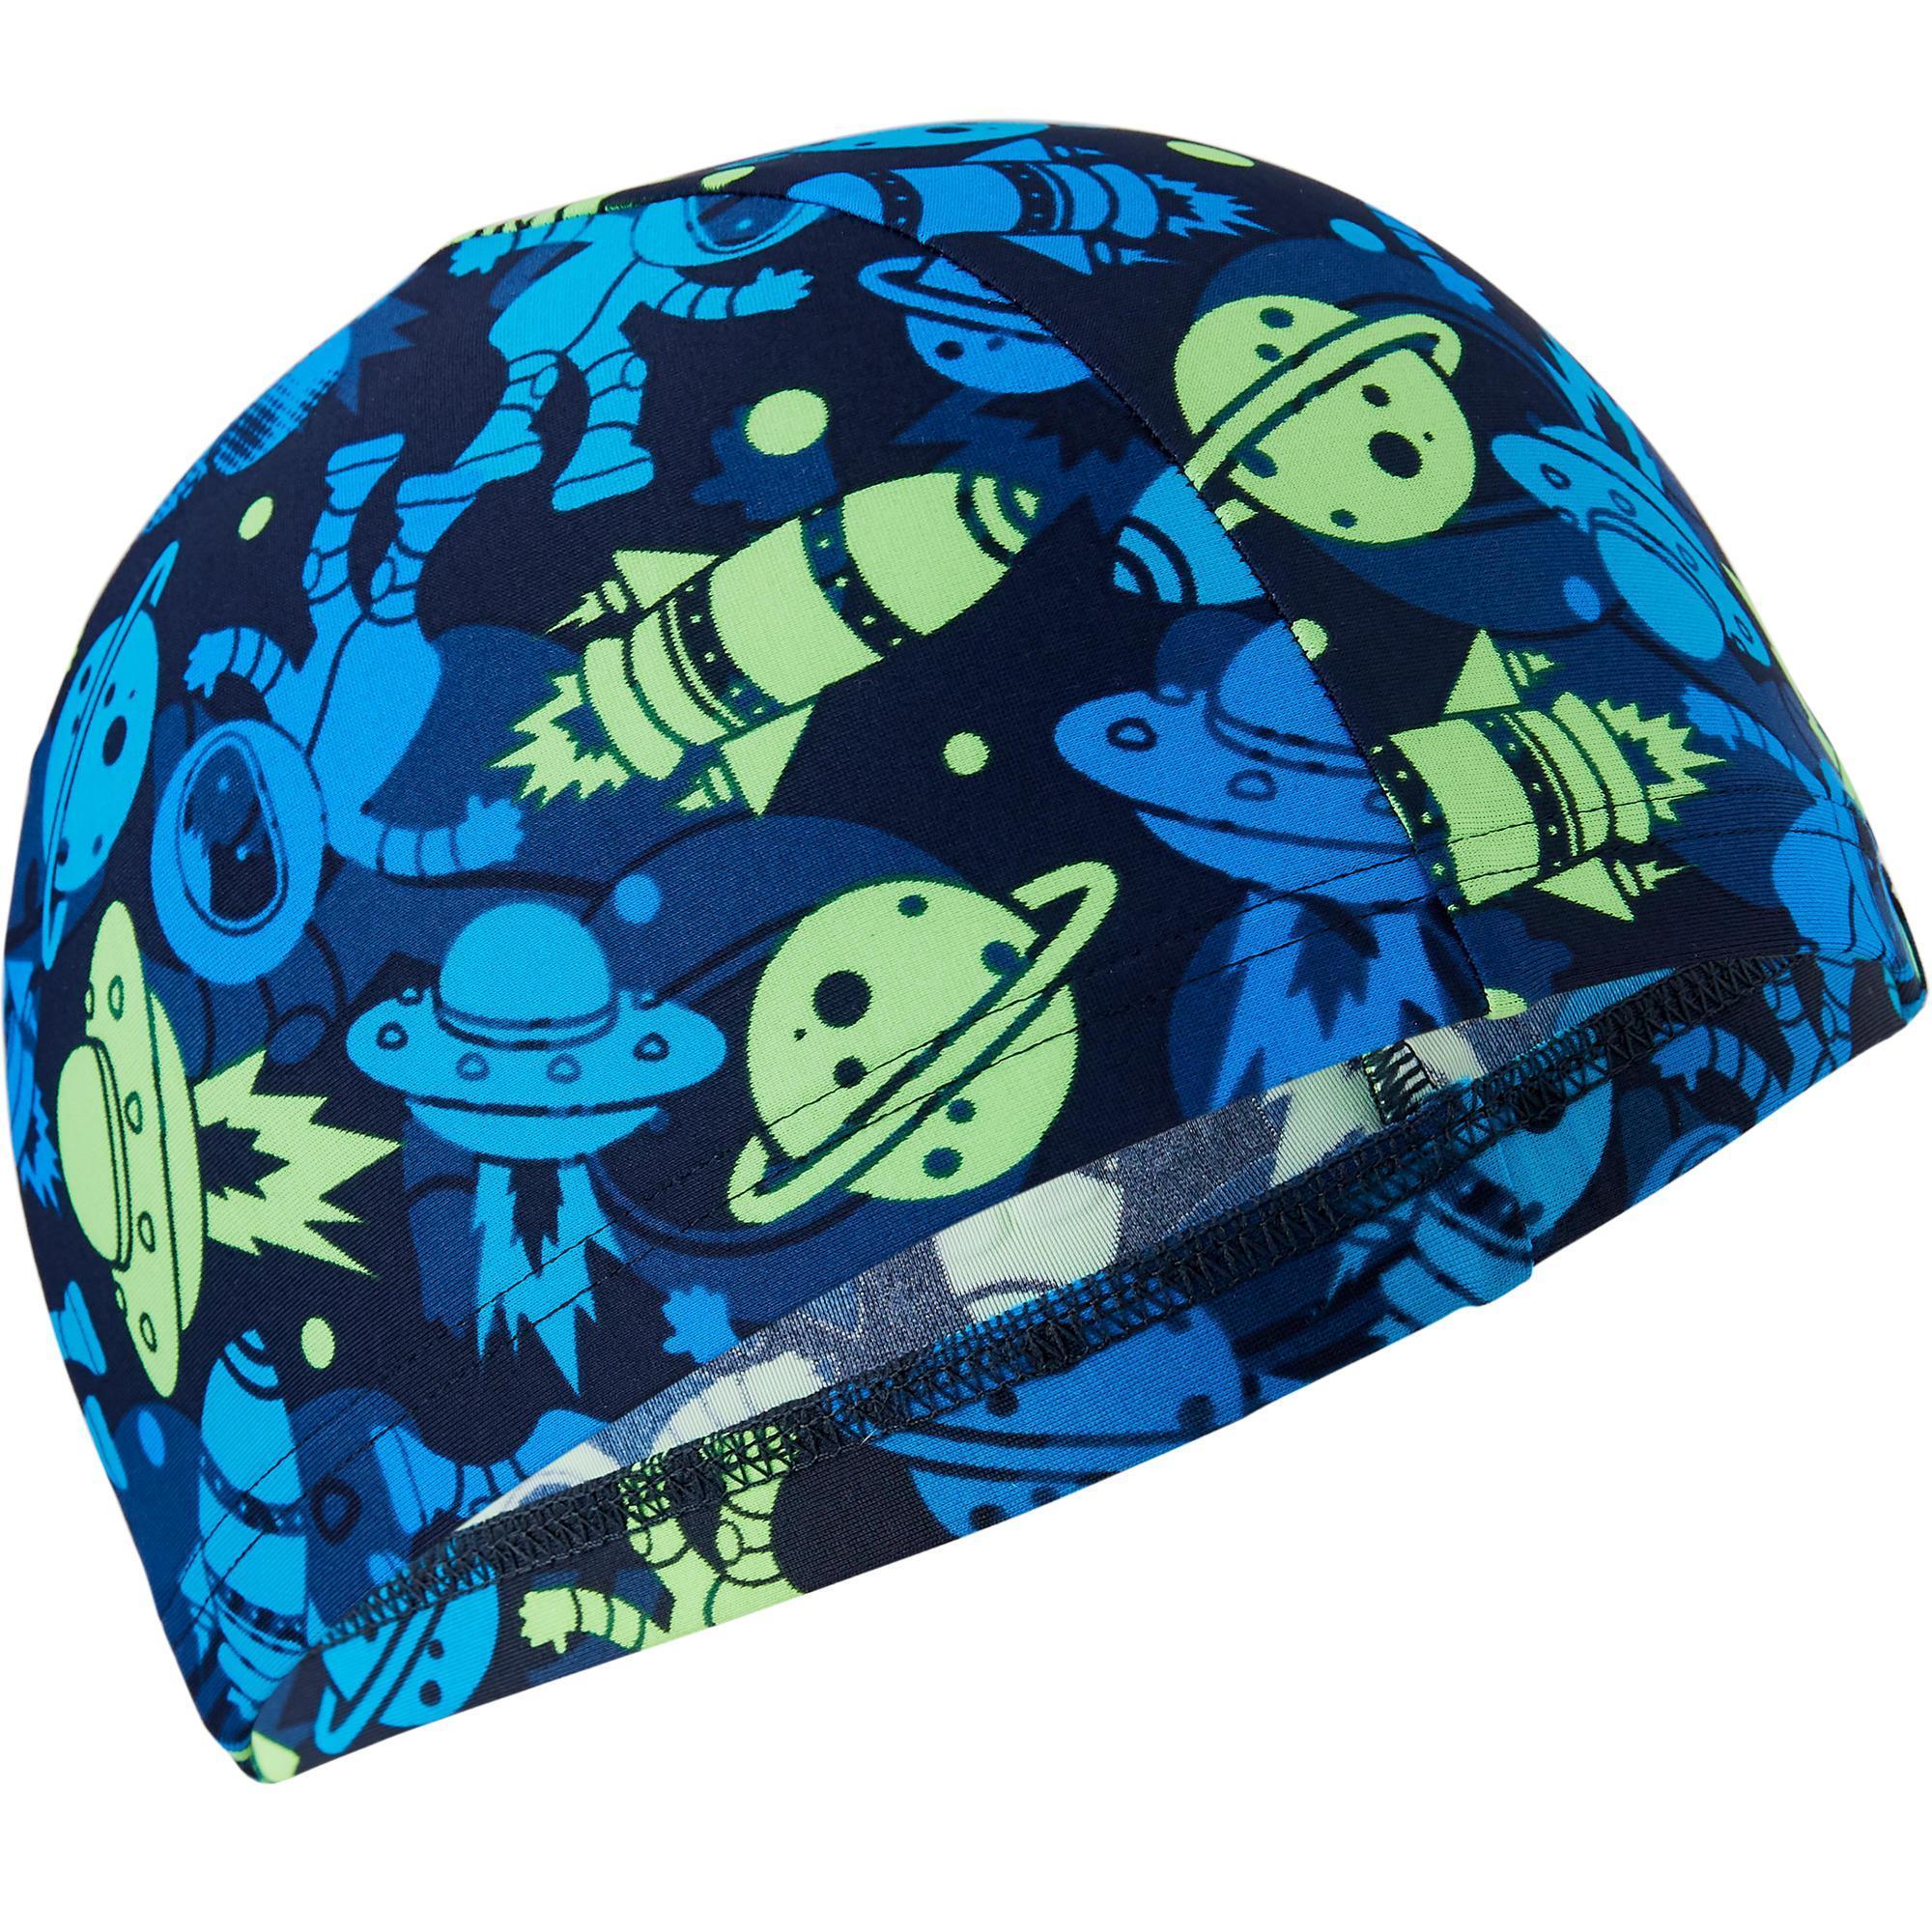 Nabaiji Stoffen badmuts textiel print maat S Astro blauw/groen